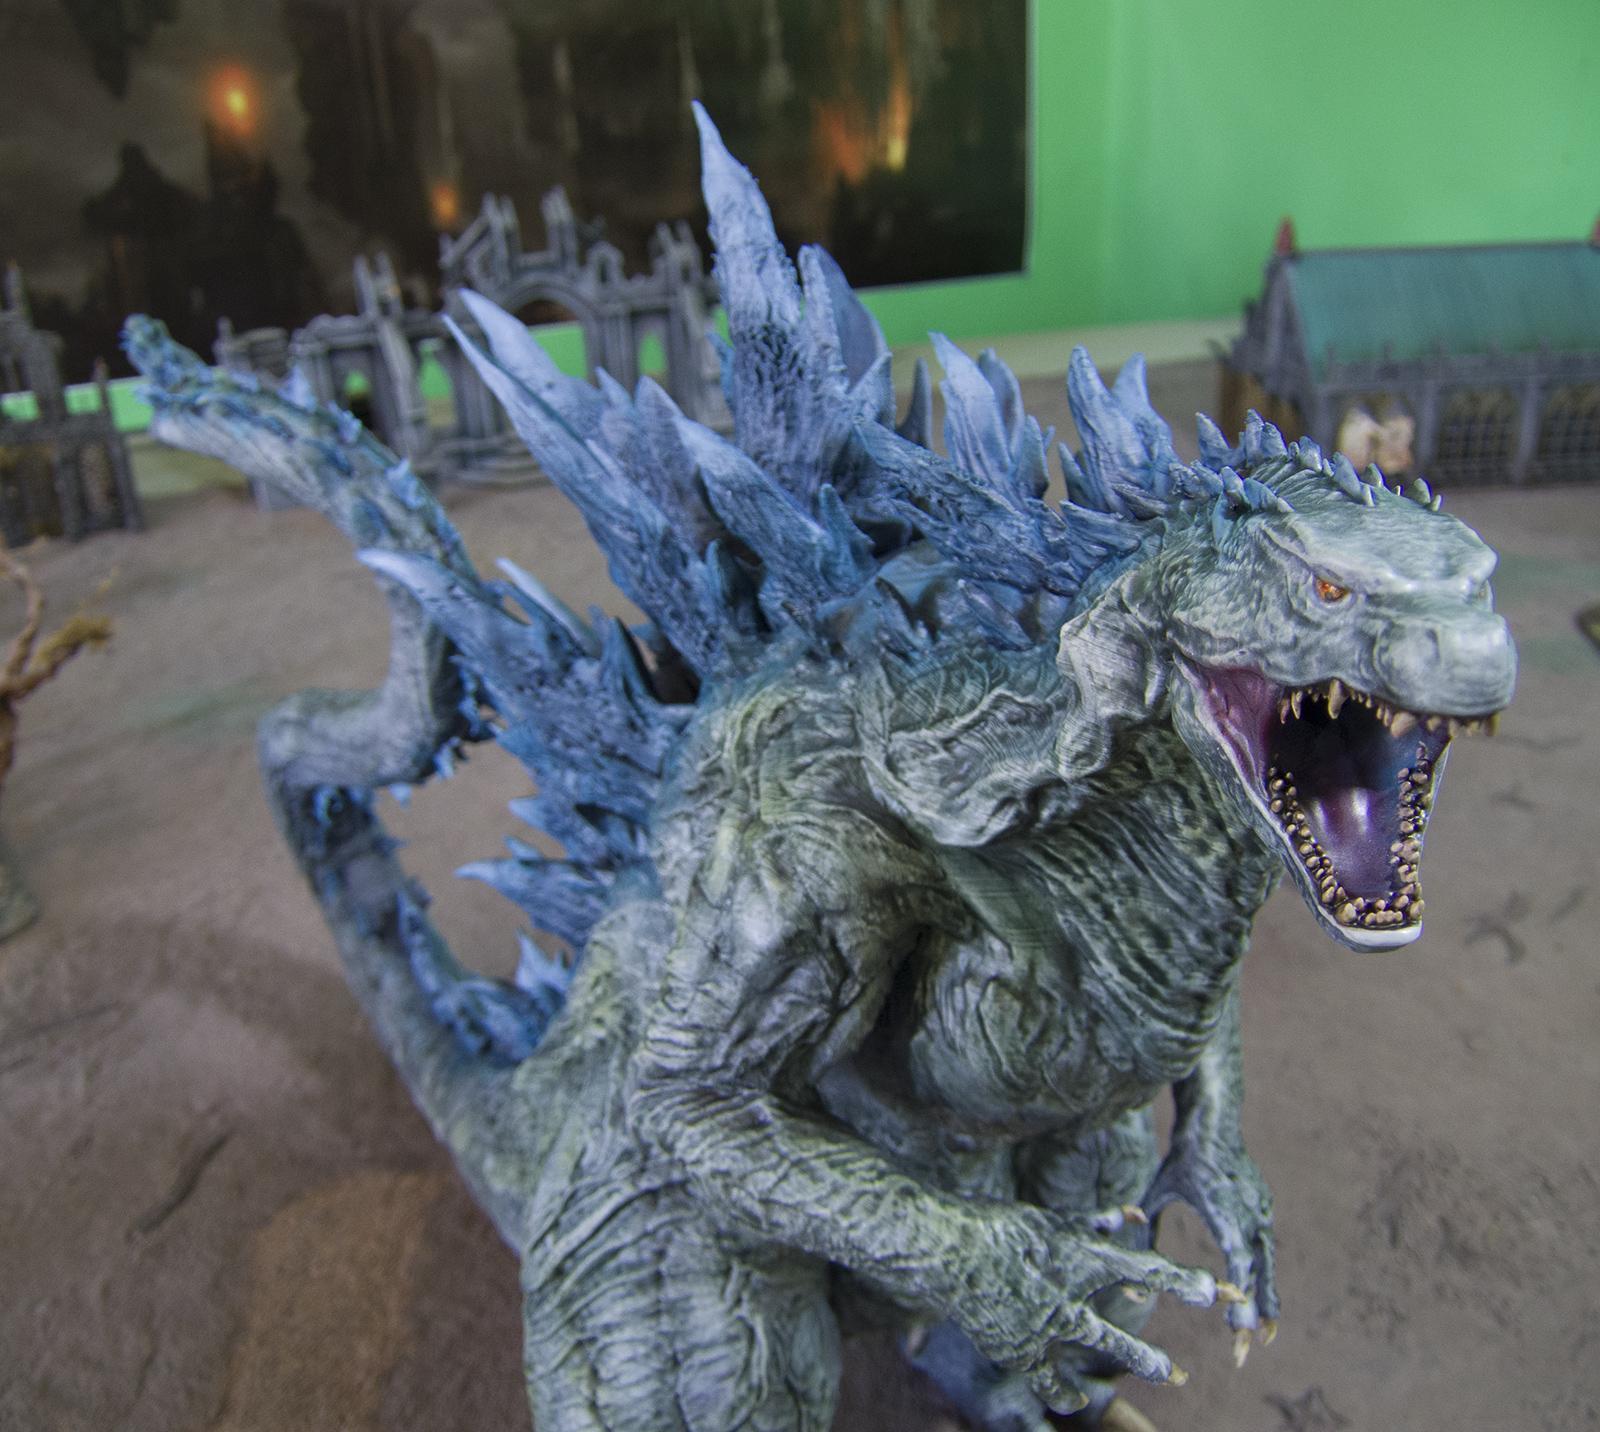 3d Printing, Anycubic I3 Mega, Anycubic Photon, Dlp, Fdm, Gambody, Godzilla, Godzilla Hybrid, Large